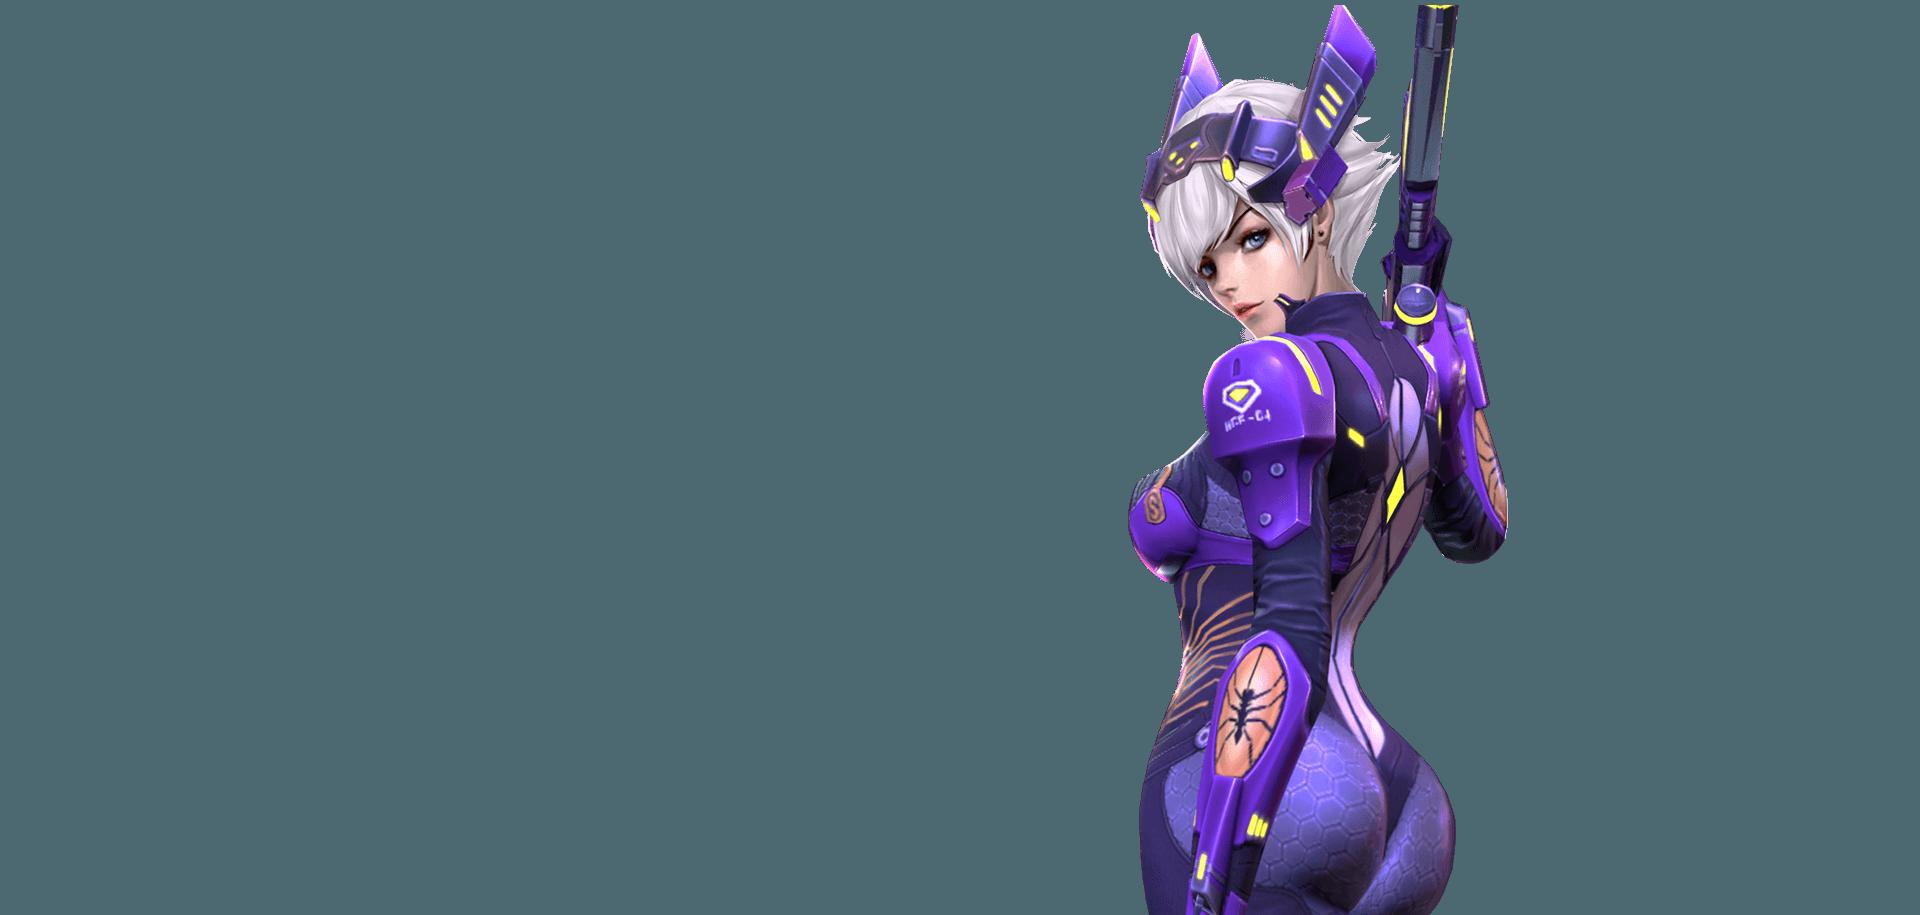 Overwatch Hero Mission Widowmaker